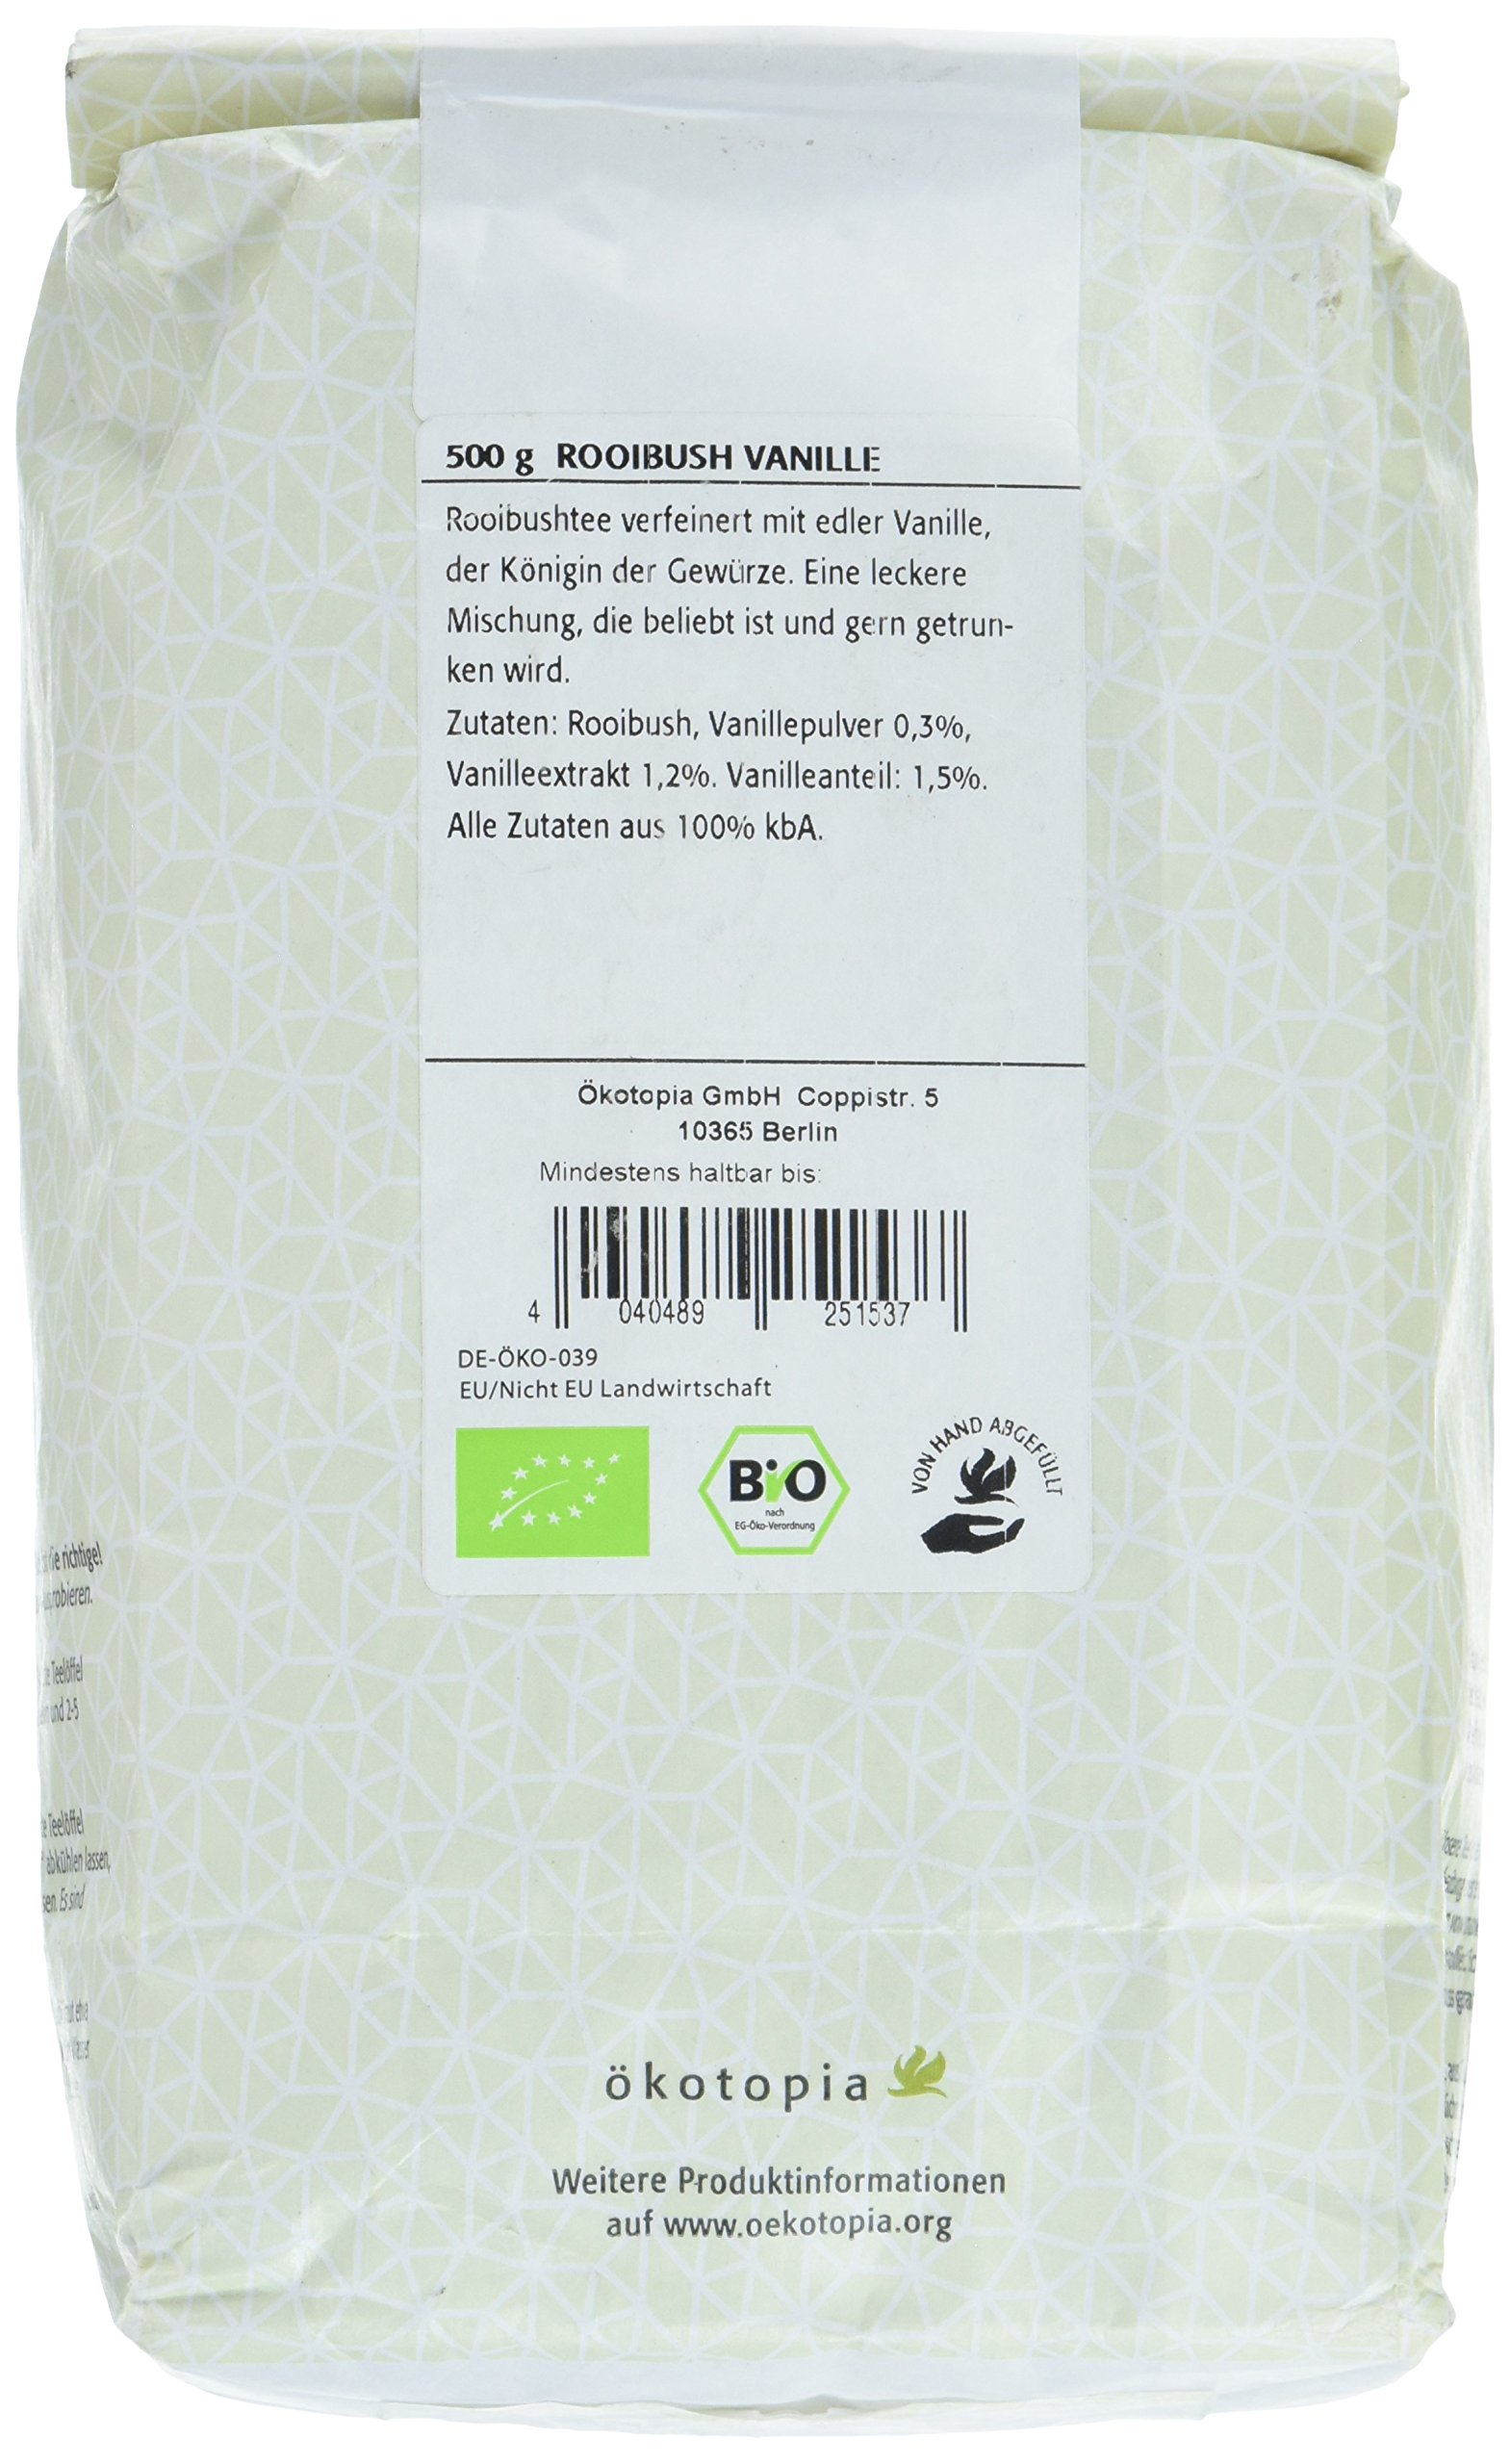 kotopia-Rooibush-Vanille-1er-Pack-1-x-500-g